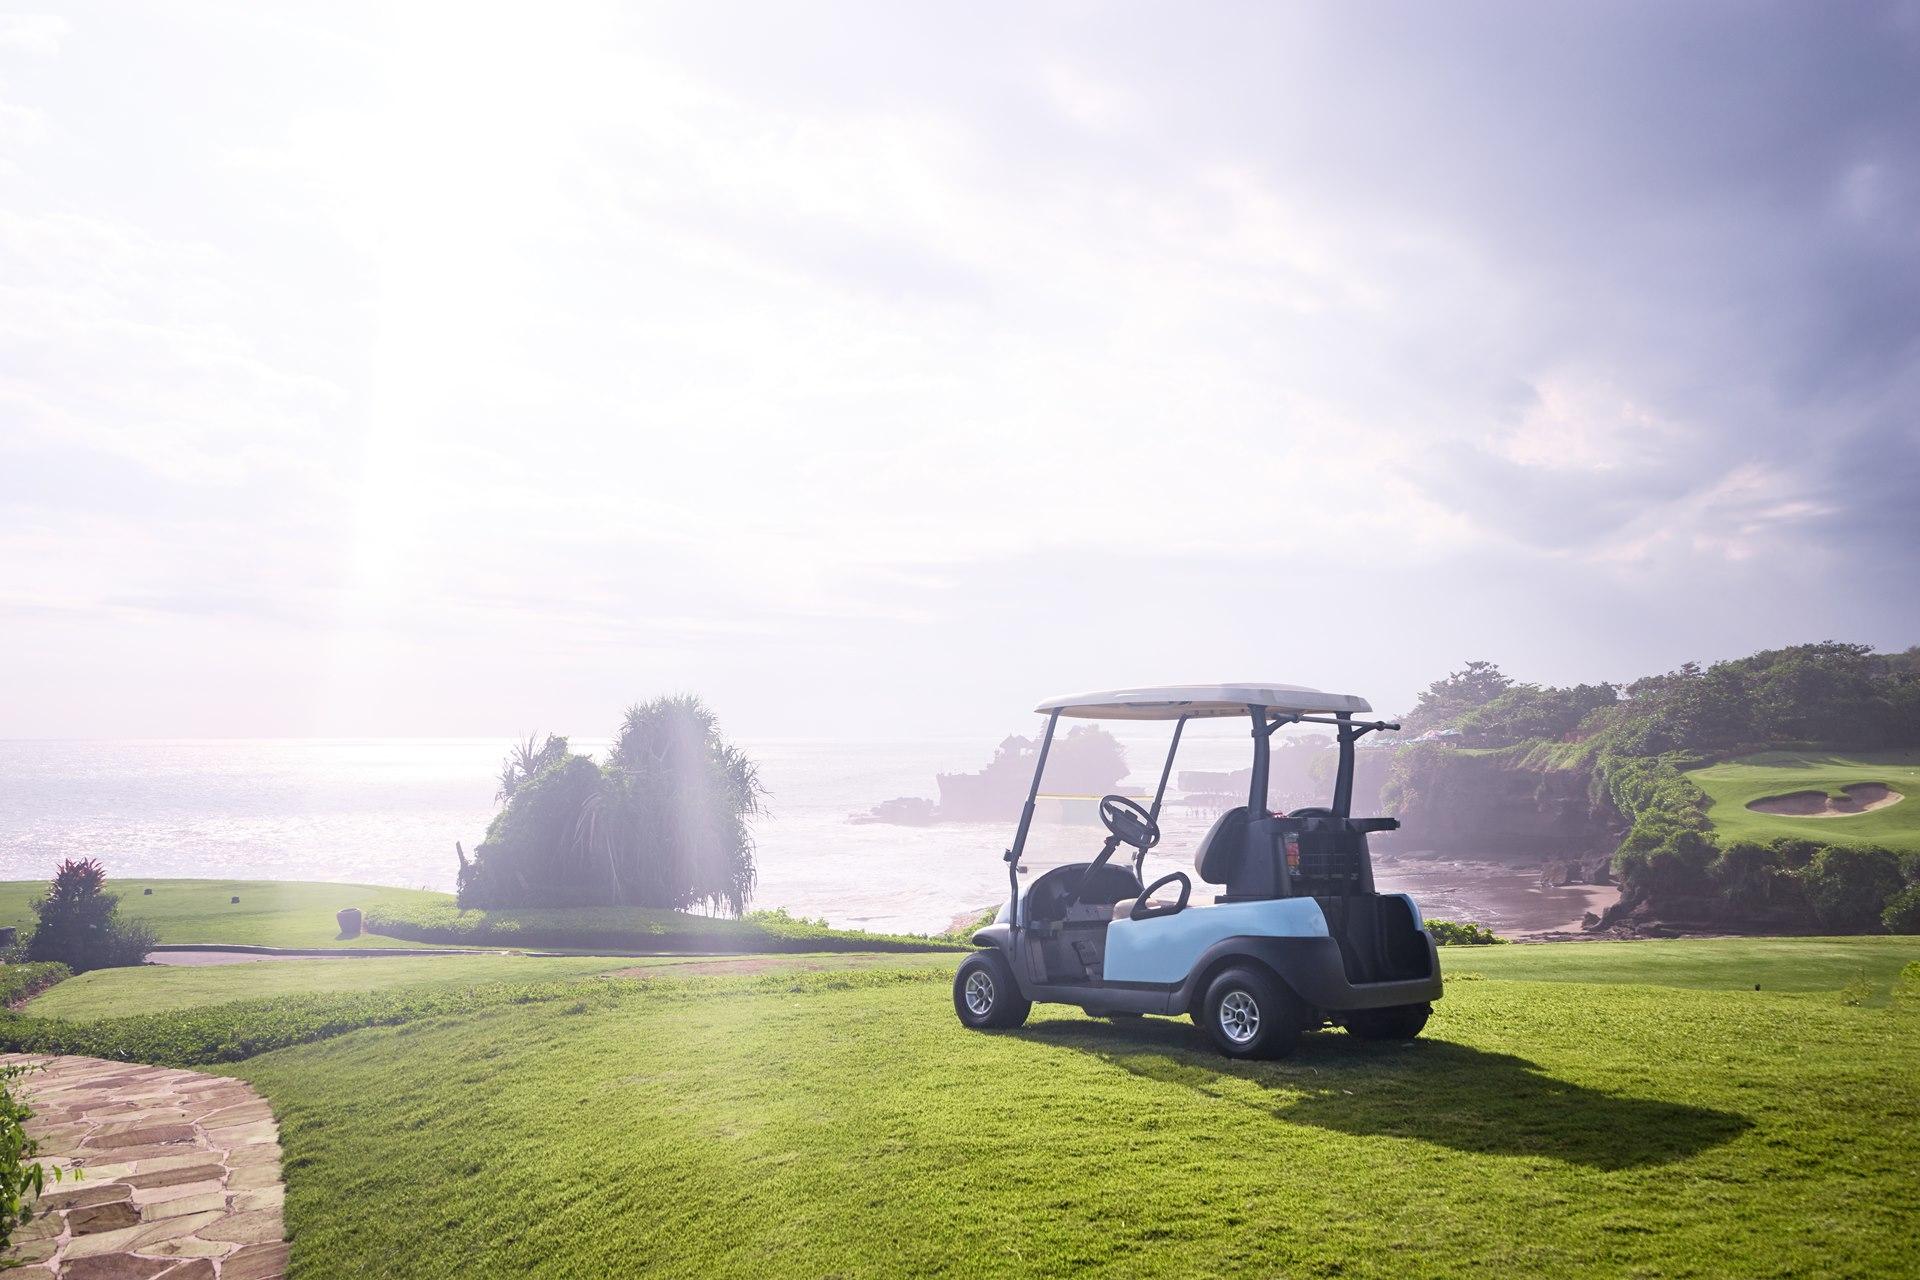 Top 5 of Asia's Golf Destinations